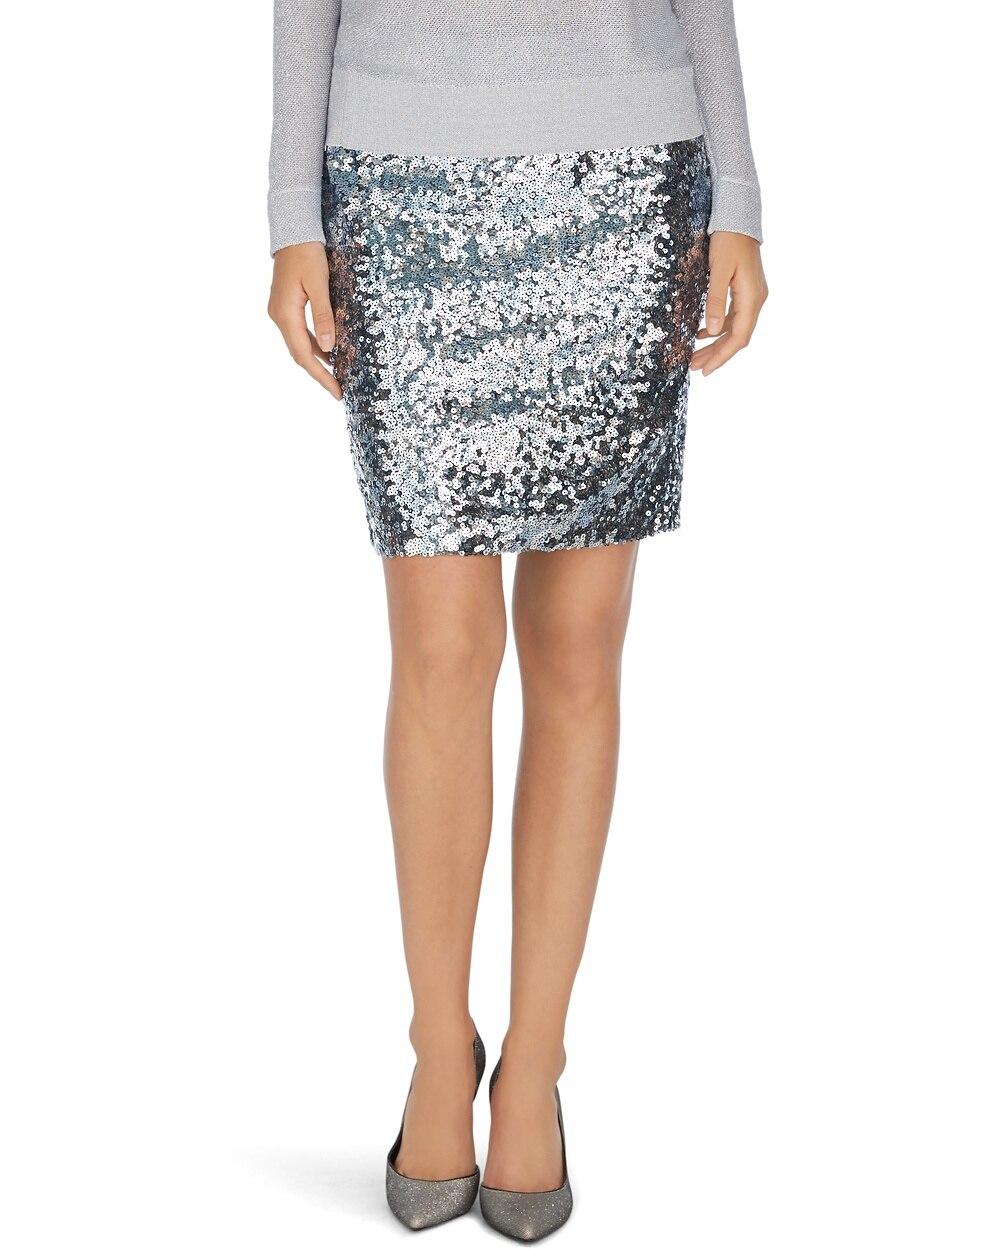 cdf1ce7d9409 Silver Sequin Mini Skirt - White House Black Market